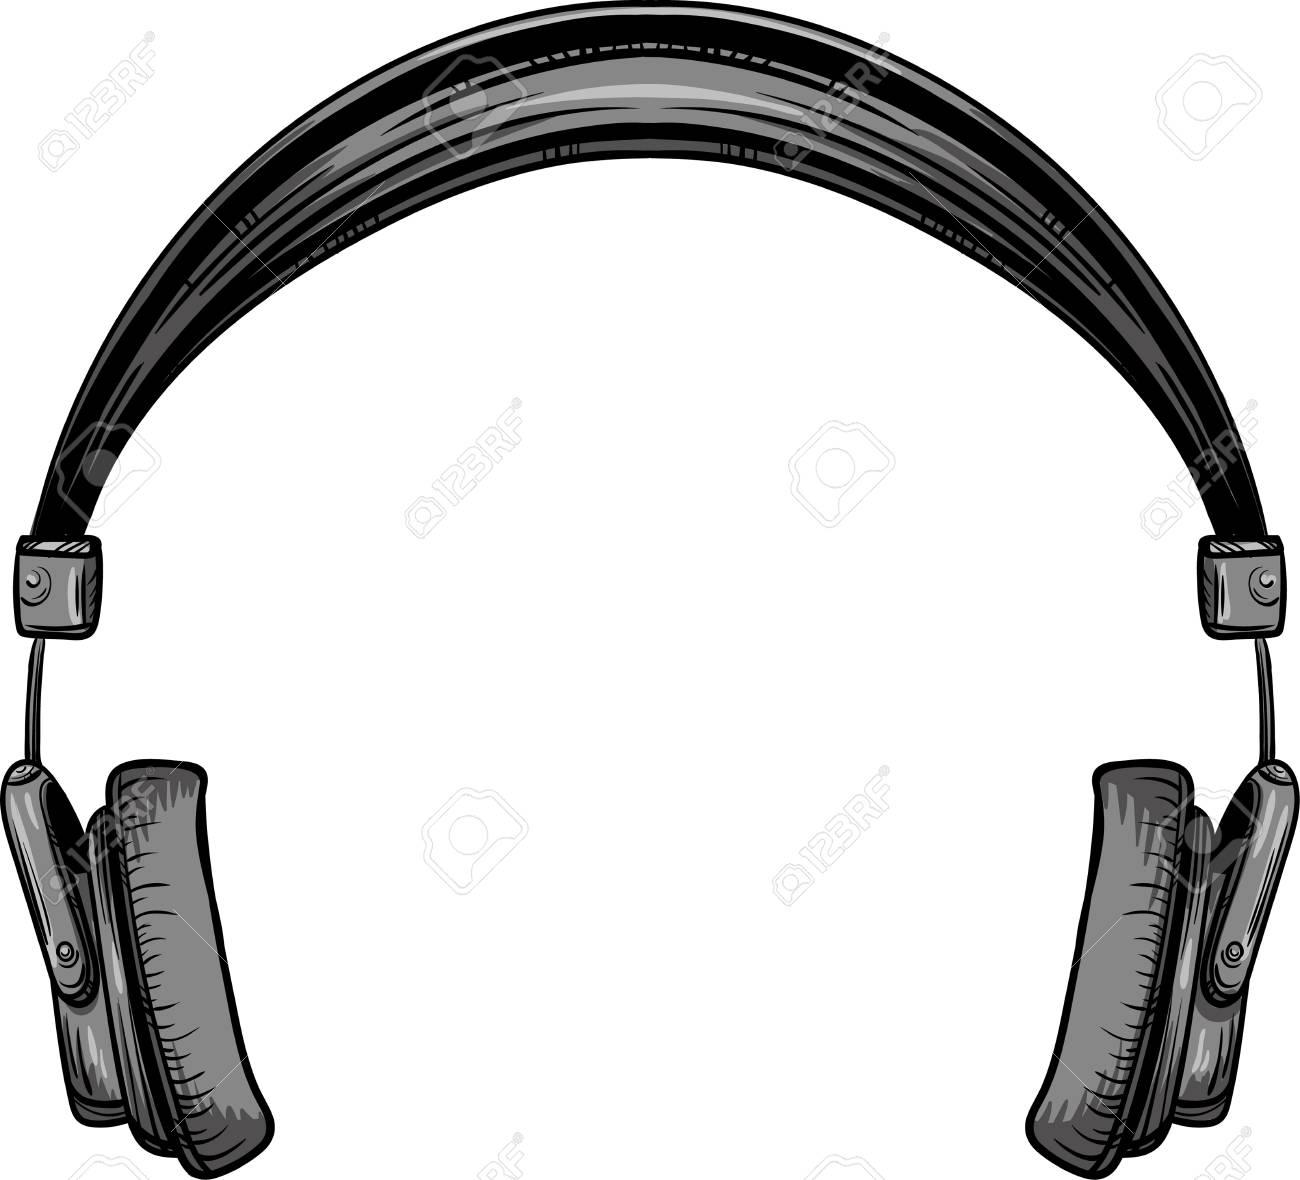 hand drawn vintage headphones vector illustration royalty free rh 123rf com headphones vector free download headphones vector illustration